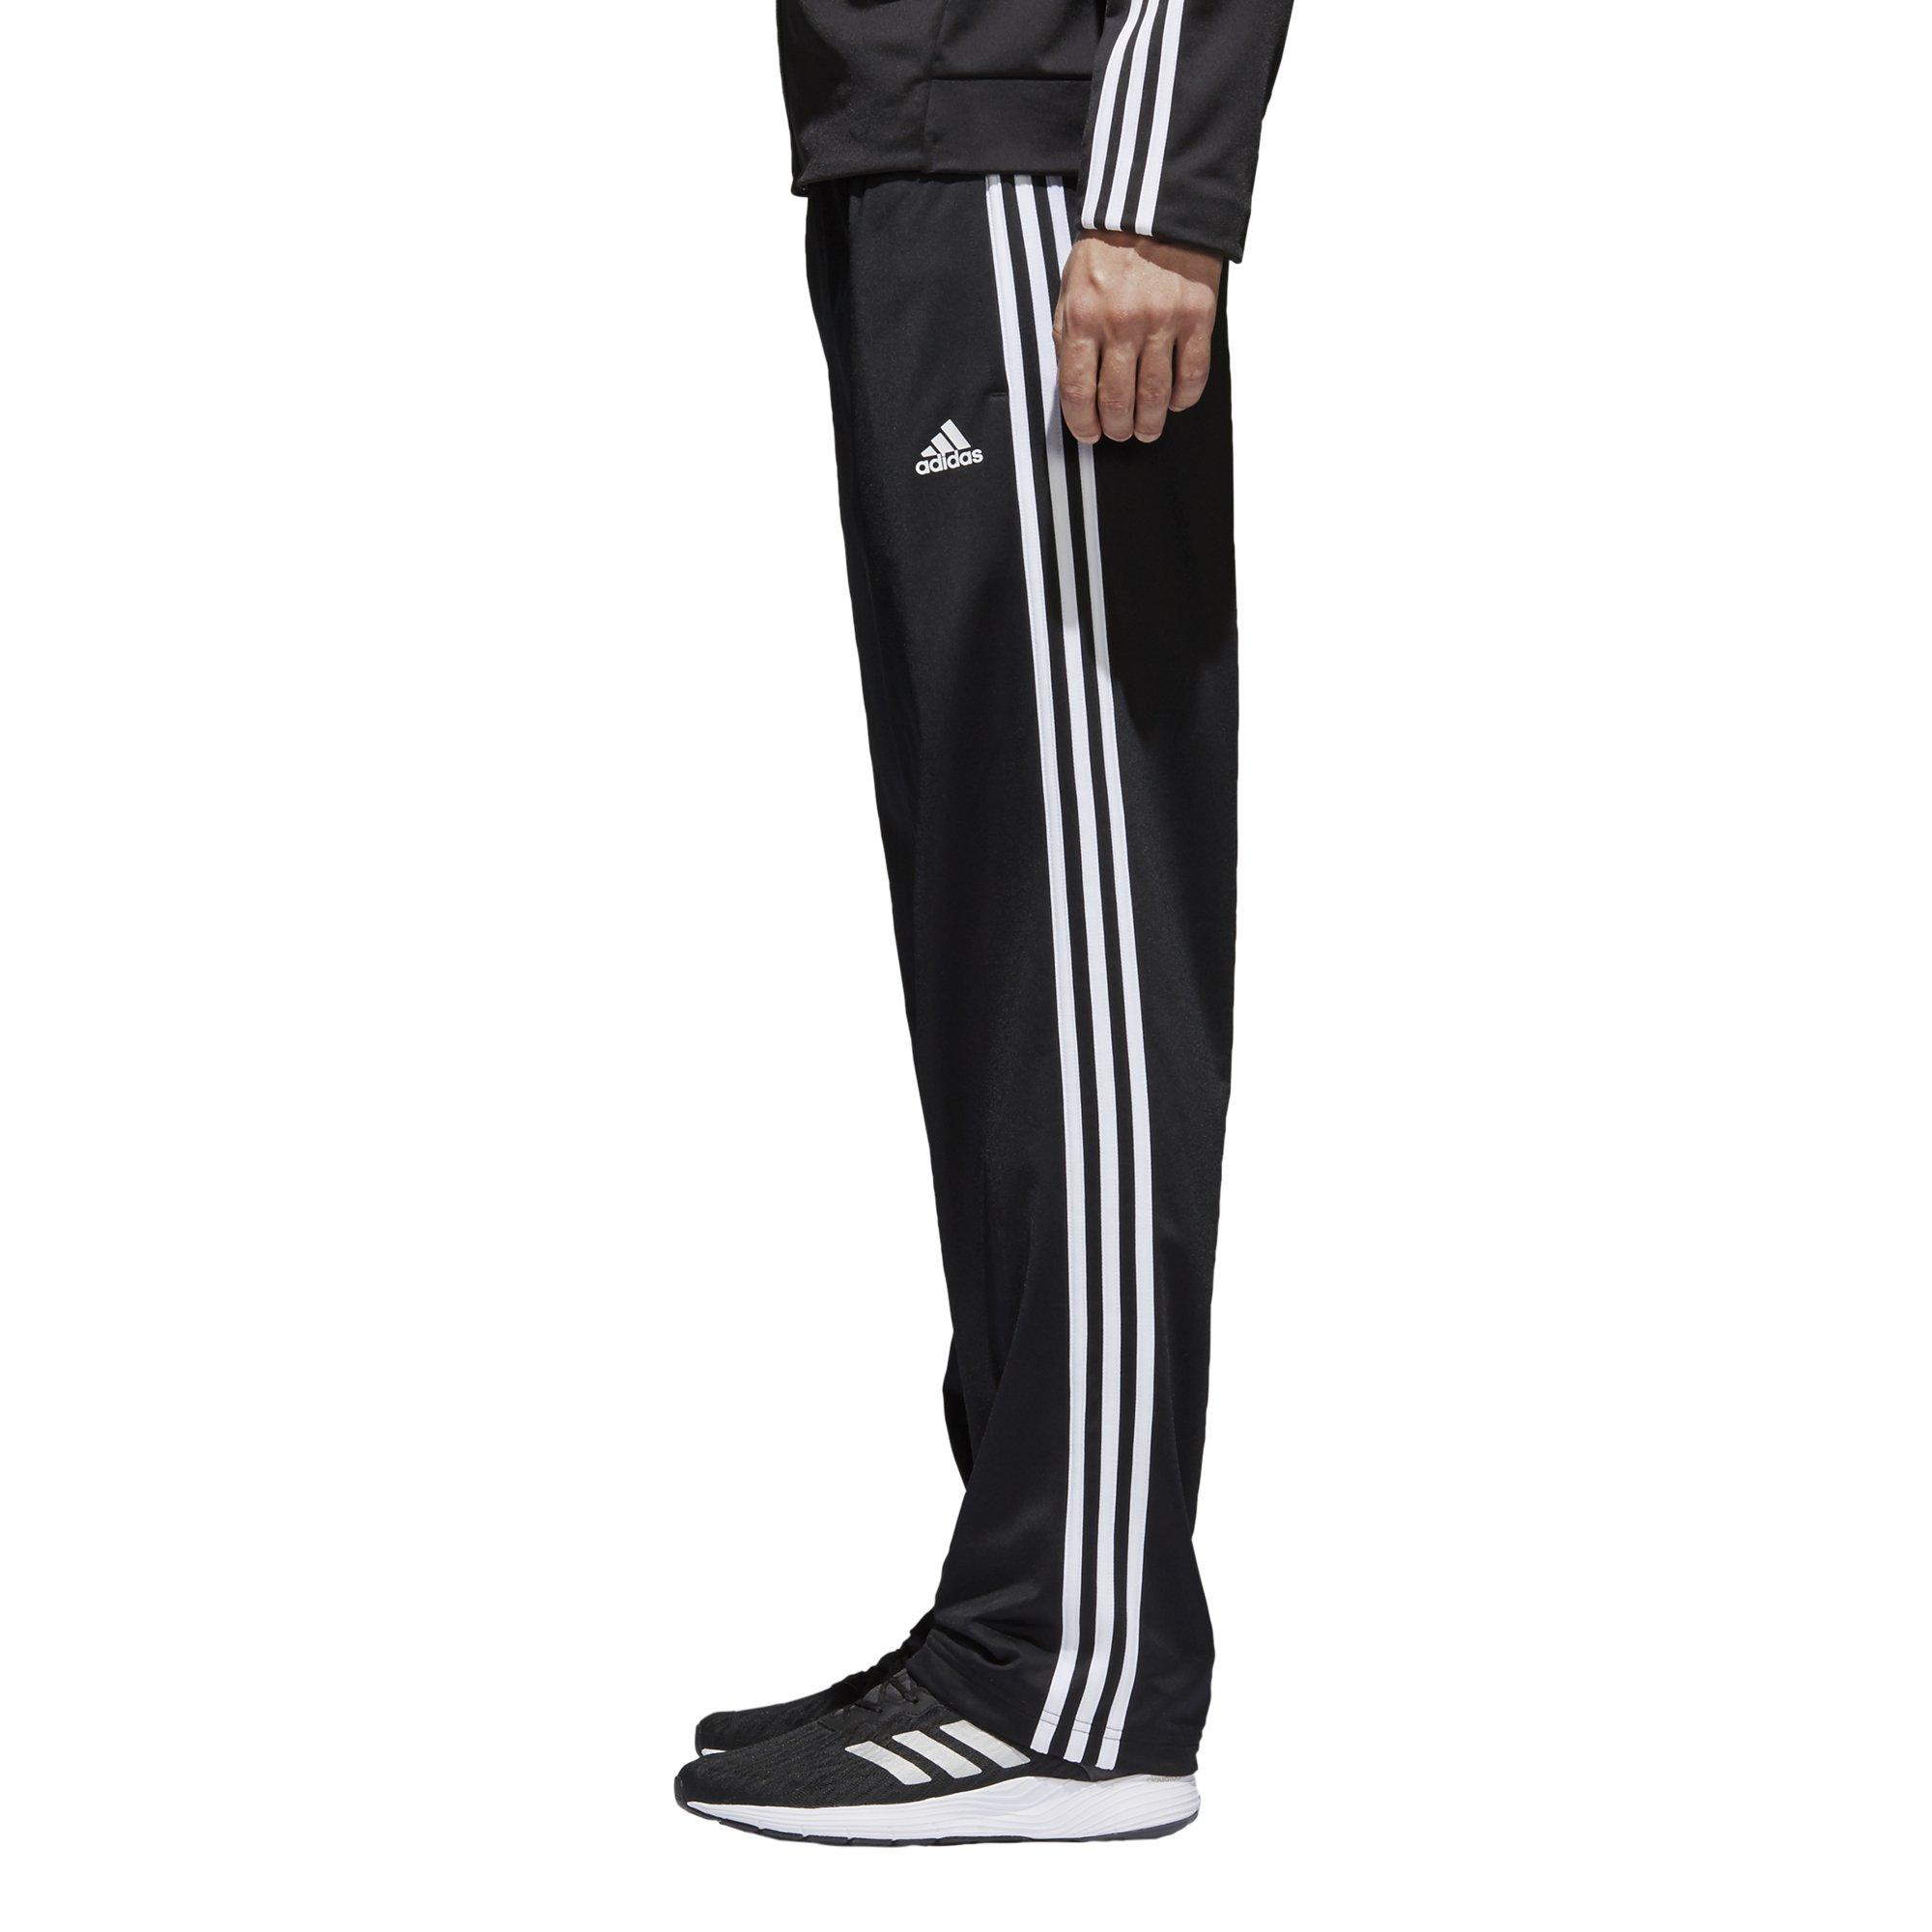 adidas Men's Athletics Essential Tricot 3-Stripe Pants, Black/White, Small by adidas (Image #4)